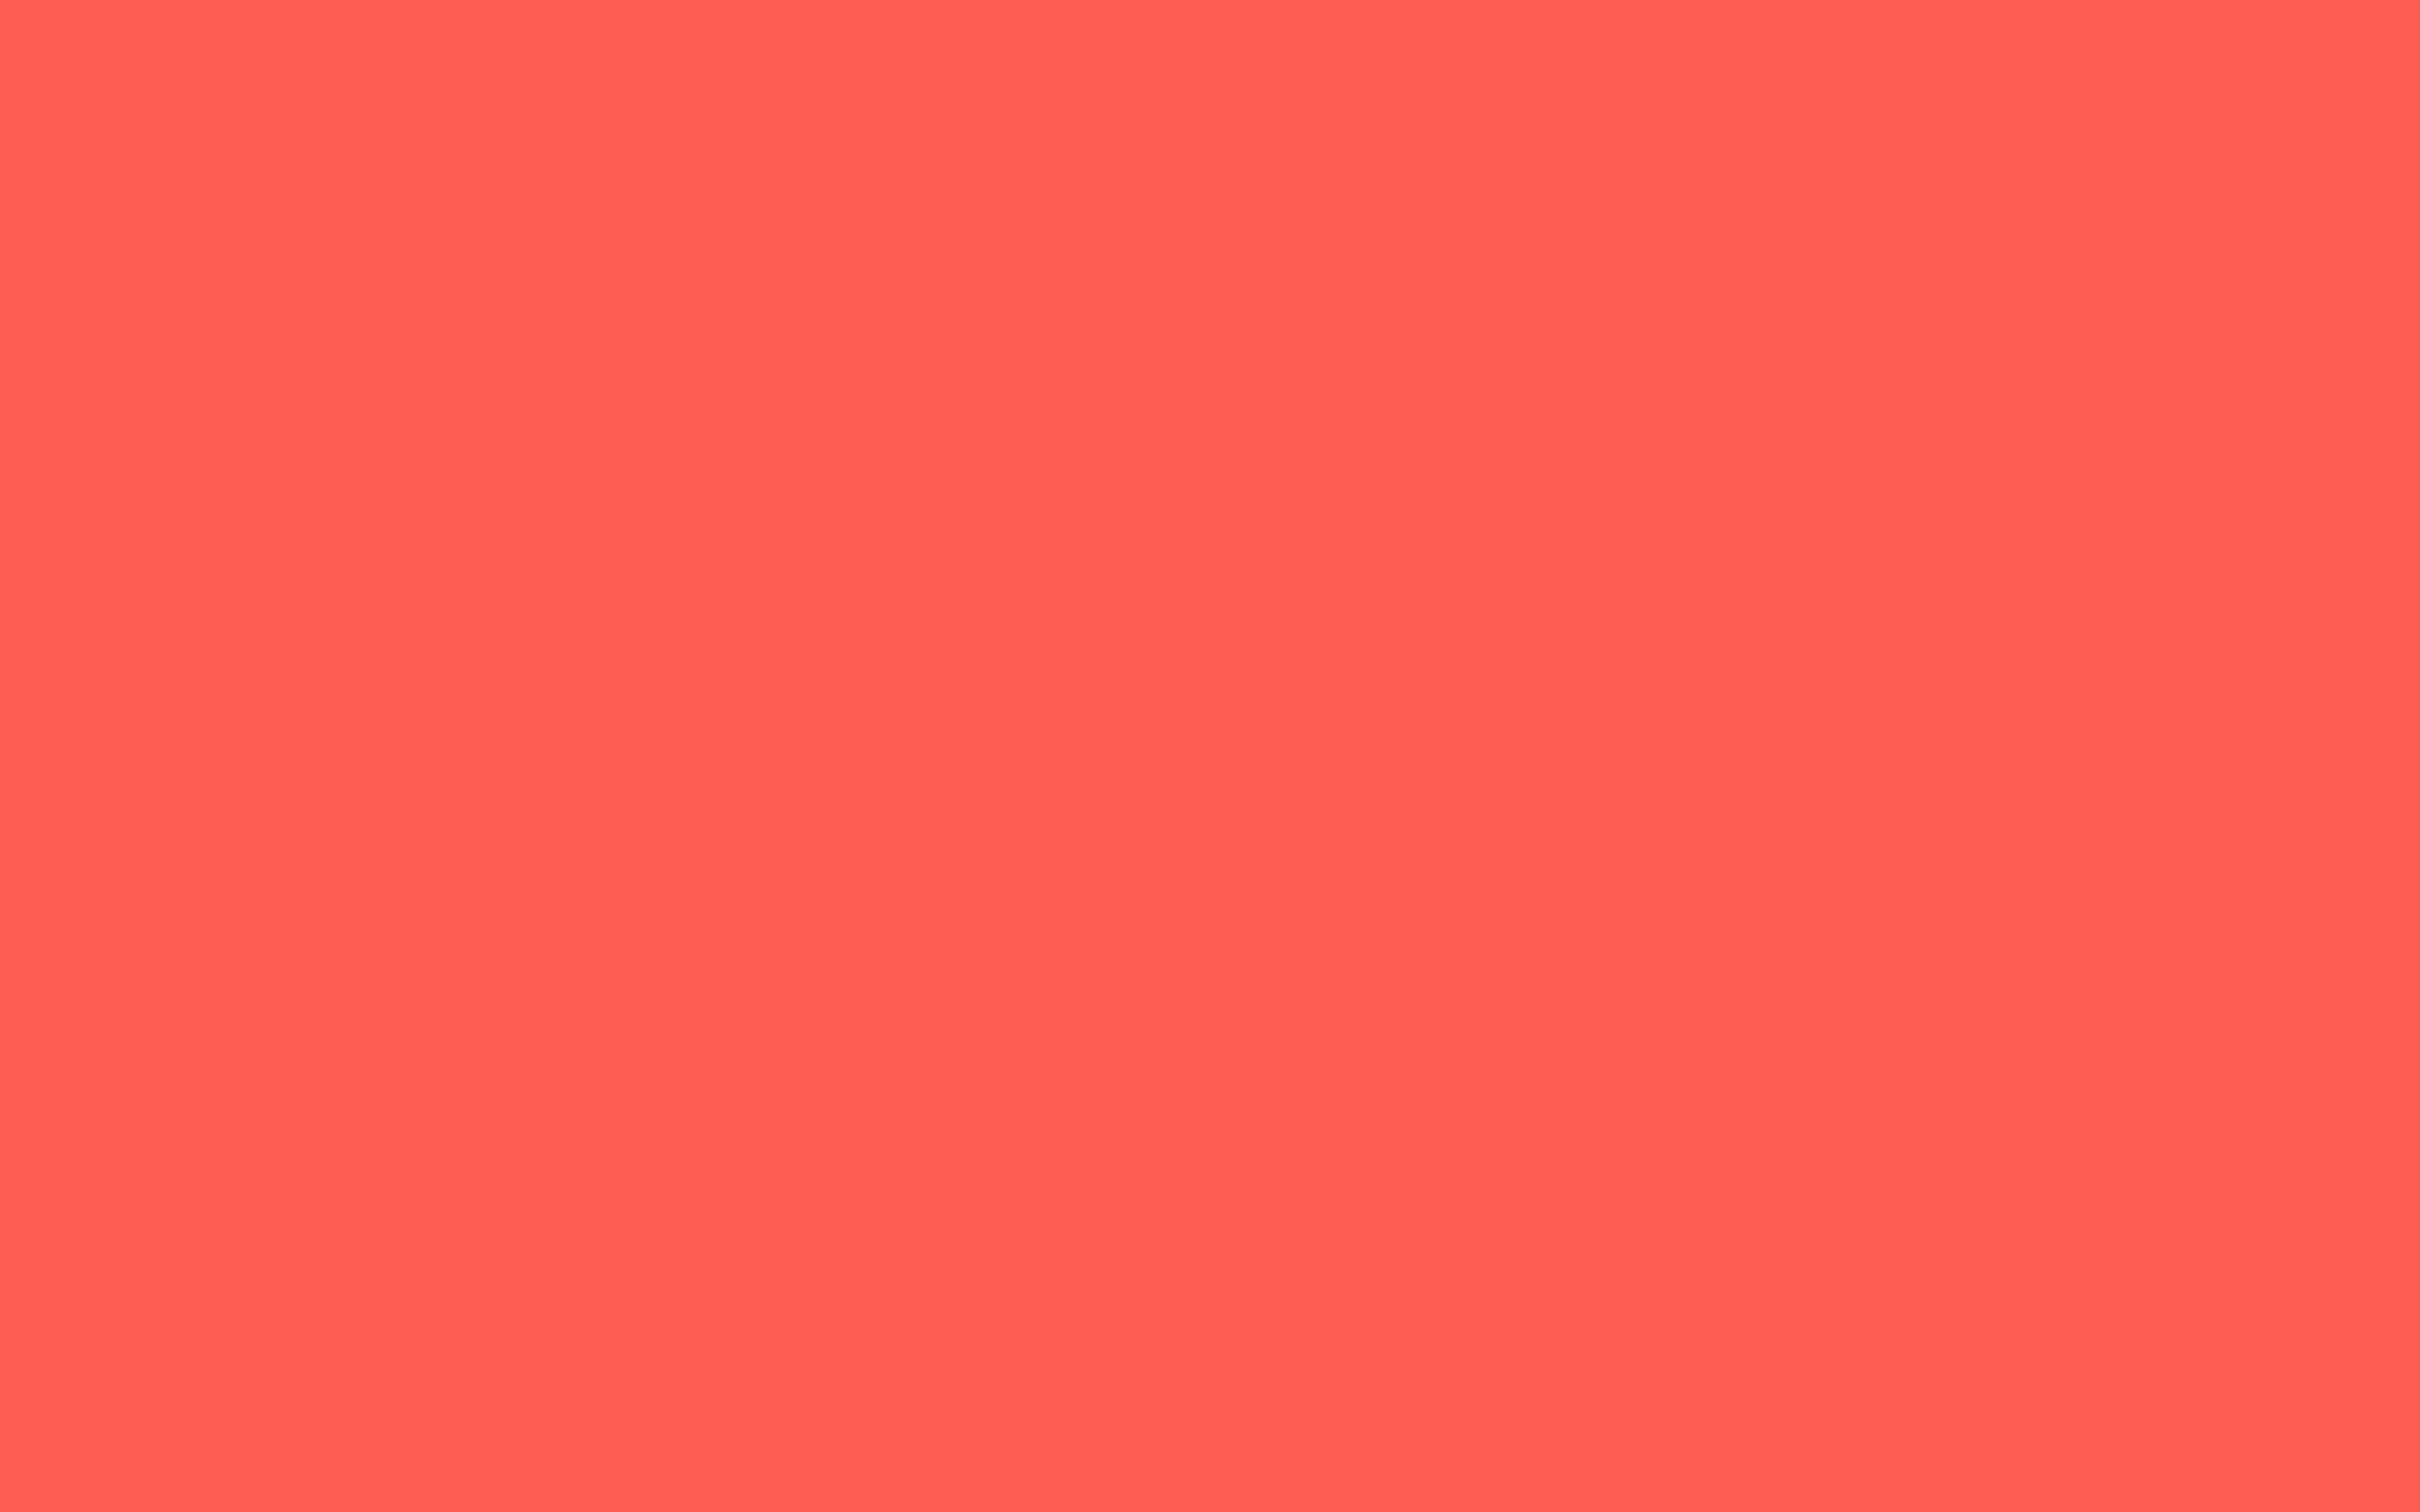 HD Solid Color Wallpaper (81+ Images